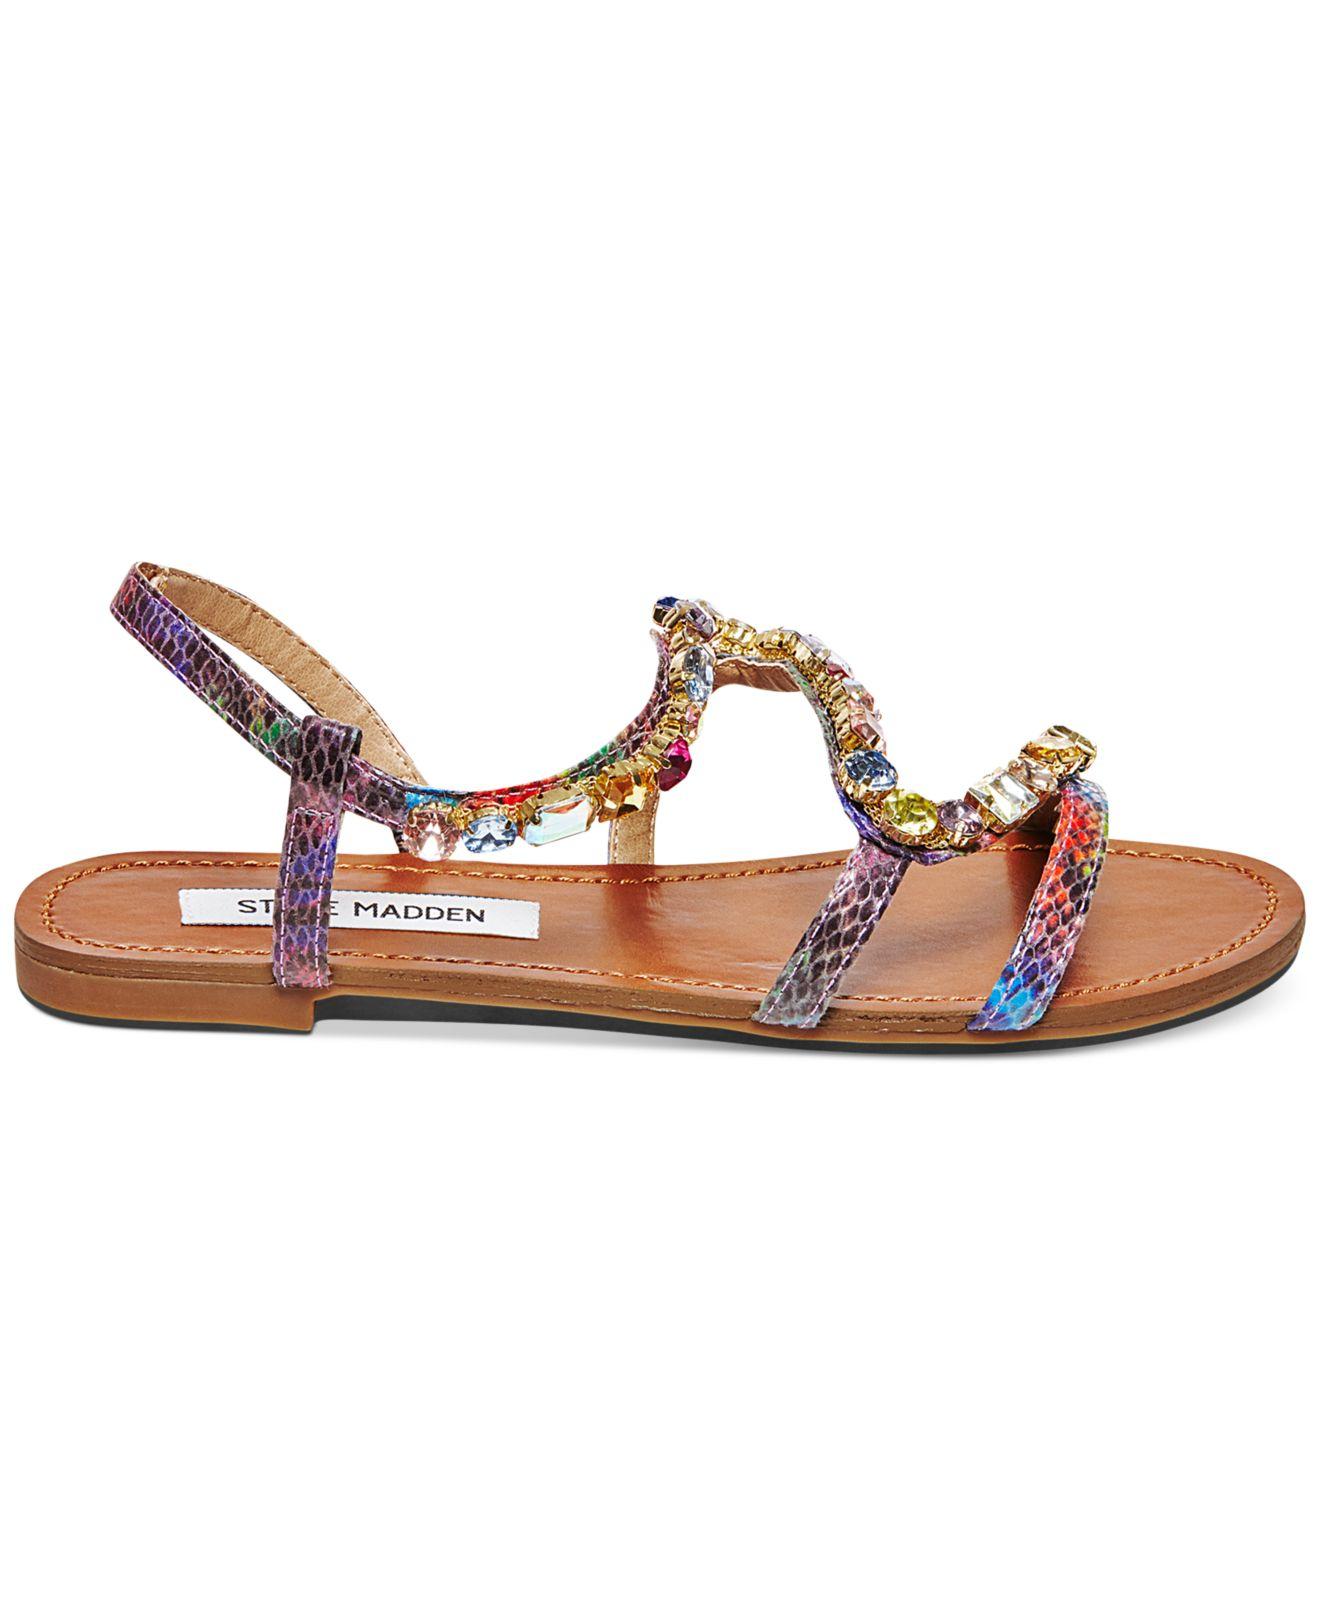 steve madden blazzzed jeweled flat sandals lyst